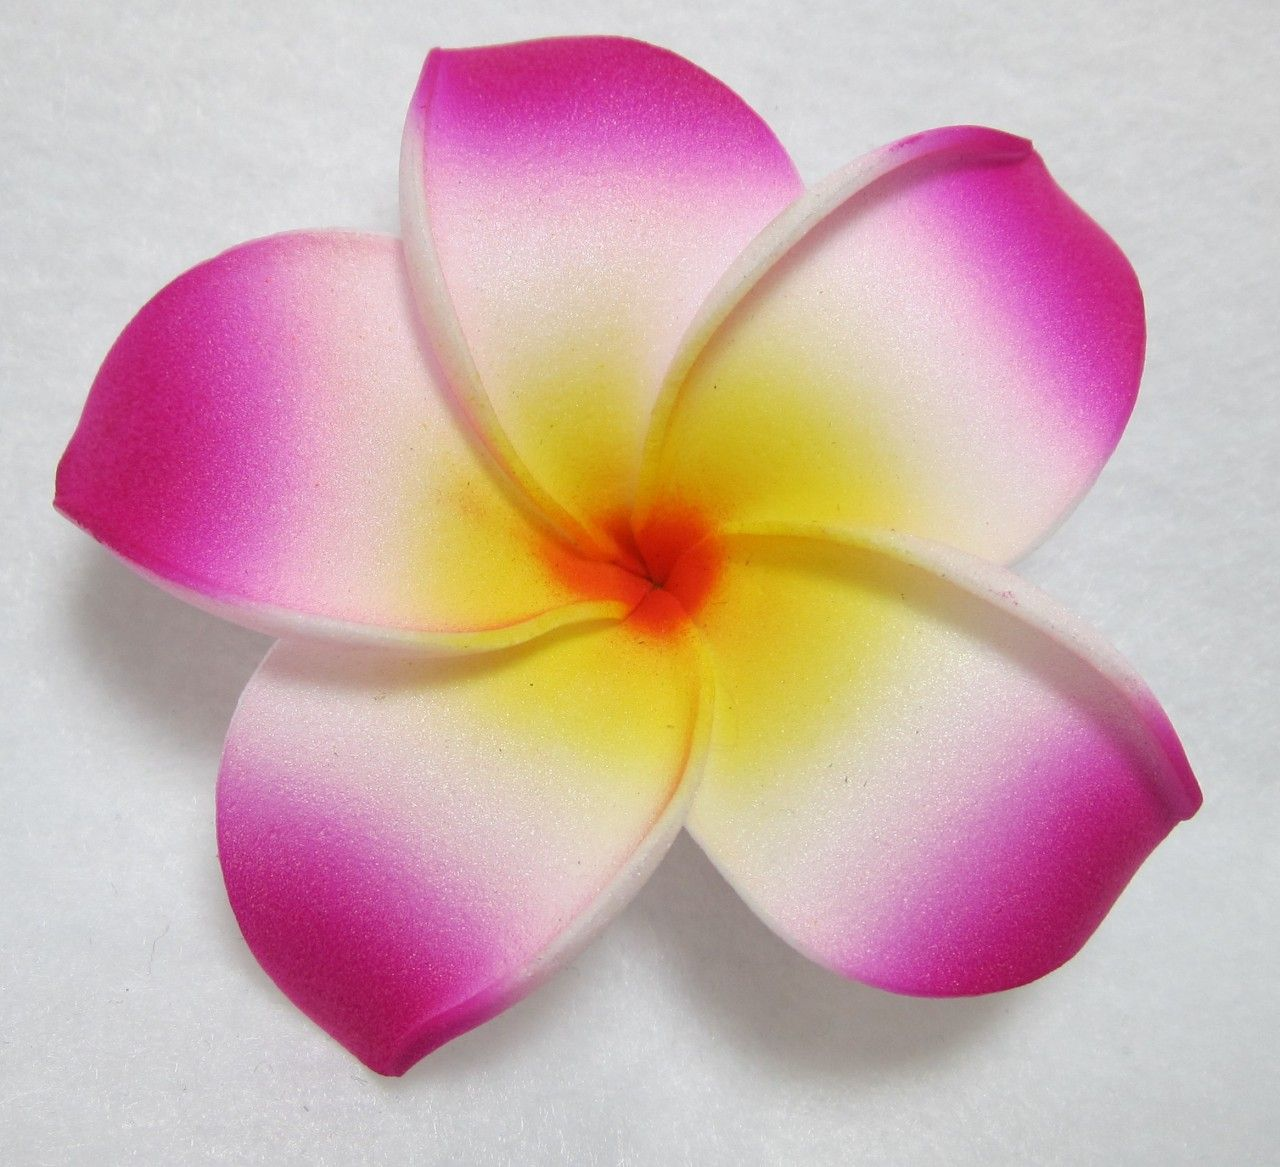 Sushi costume garnish medium pink plumeria flower hair clip my medium pink plumeria flower hair clip mightylinksfo